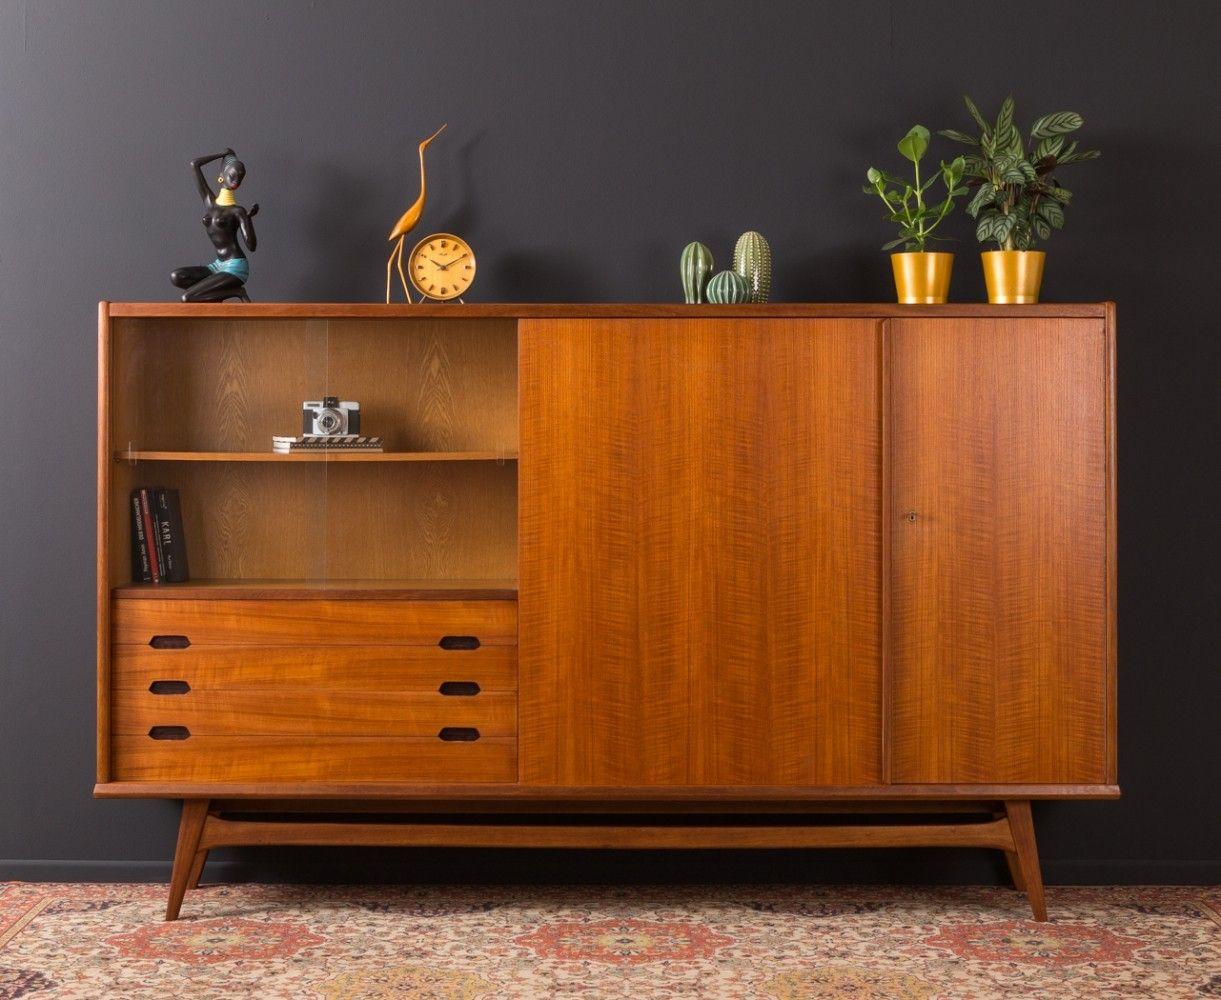 For Sale German Buffet In Scandinavian Design 1950s Scandinavian Furniture Luxury Furniture Dream Houses Furniture Design Modern